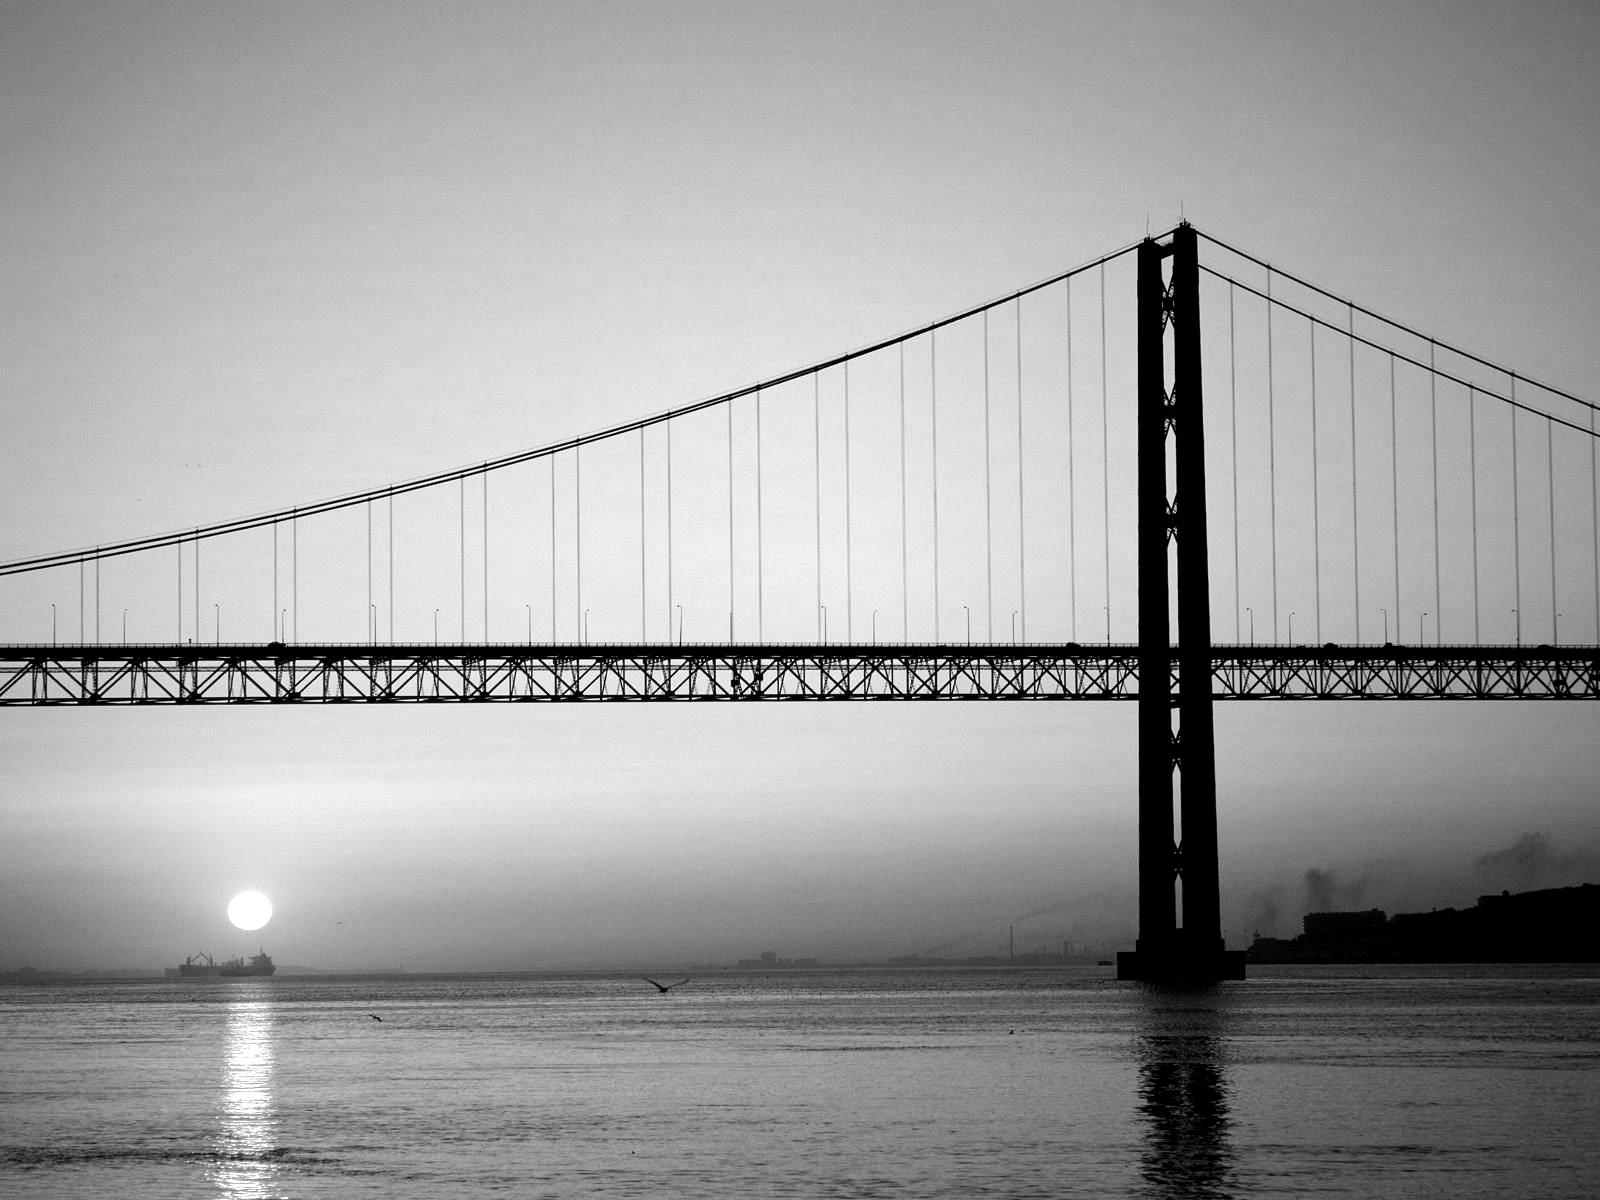 Bridge Black And White Photography